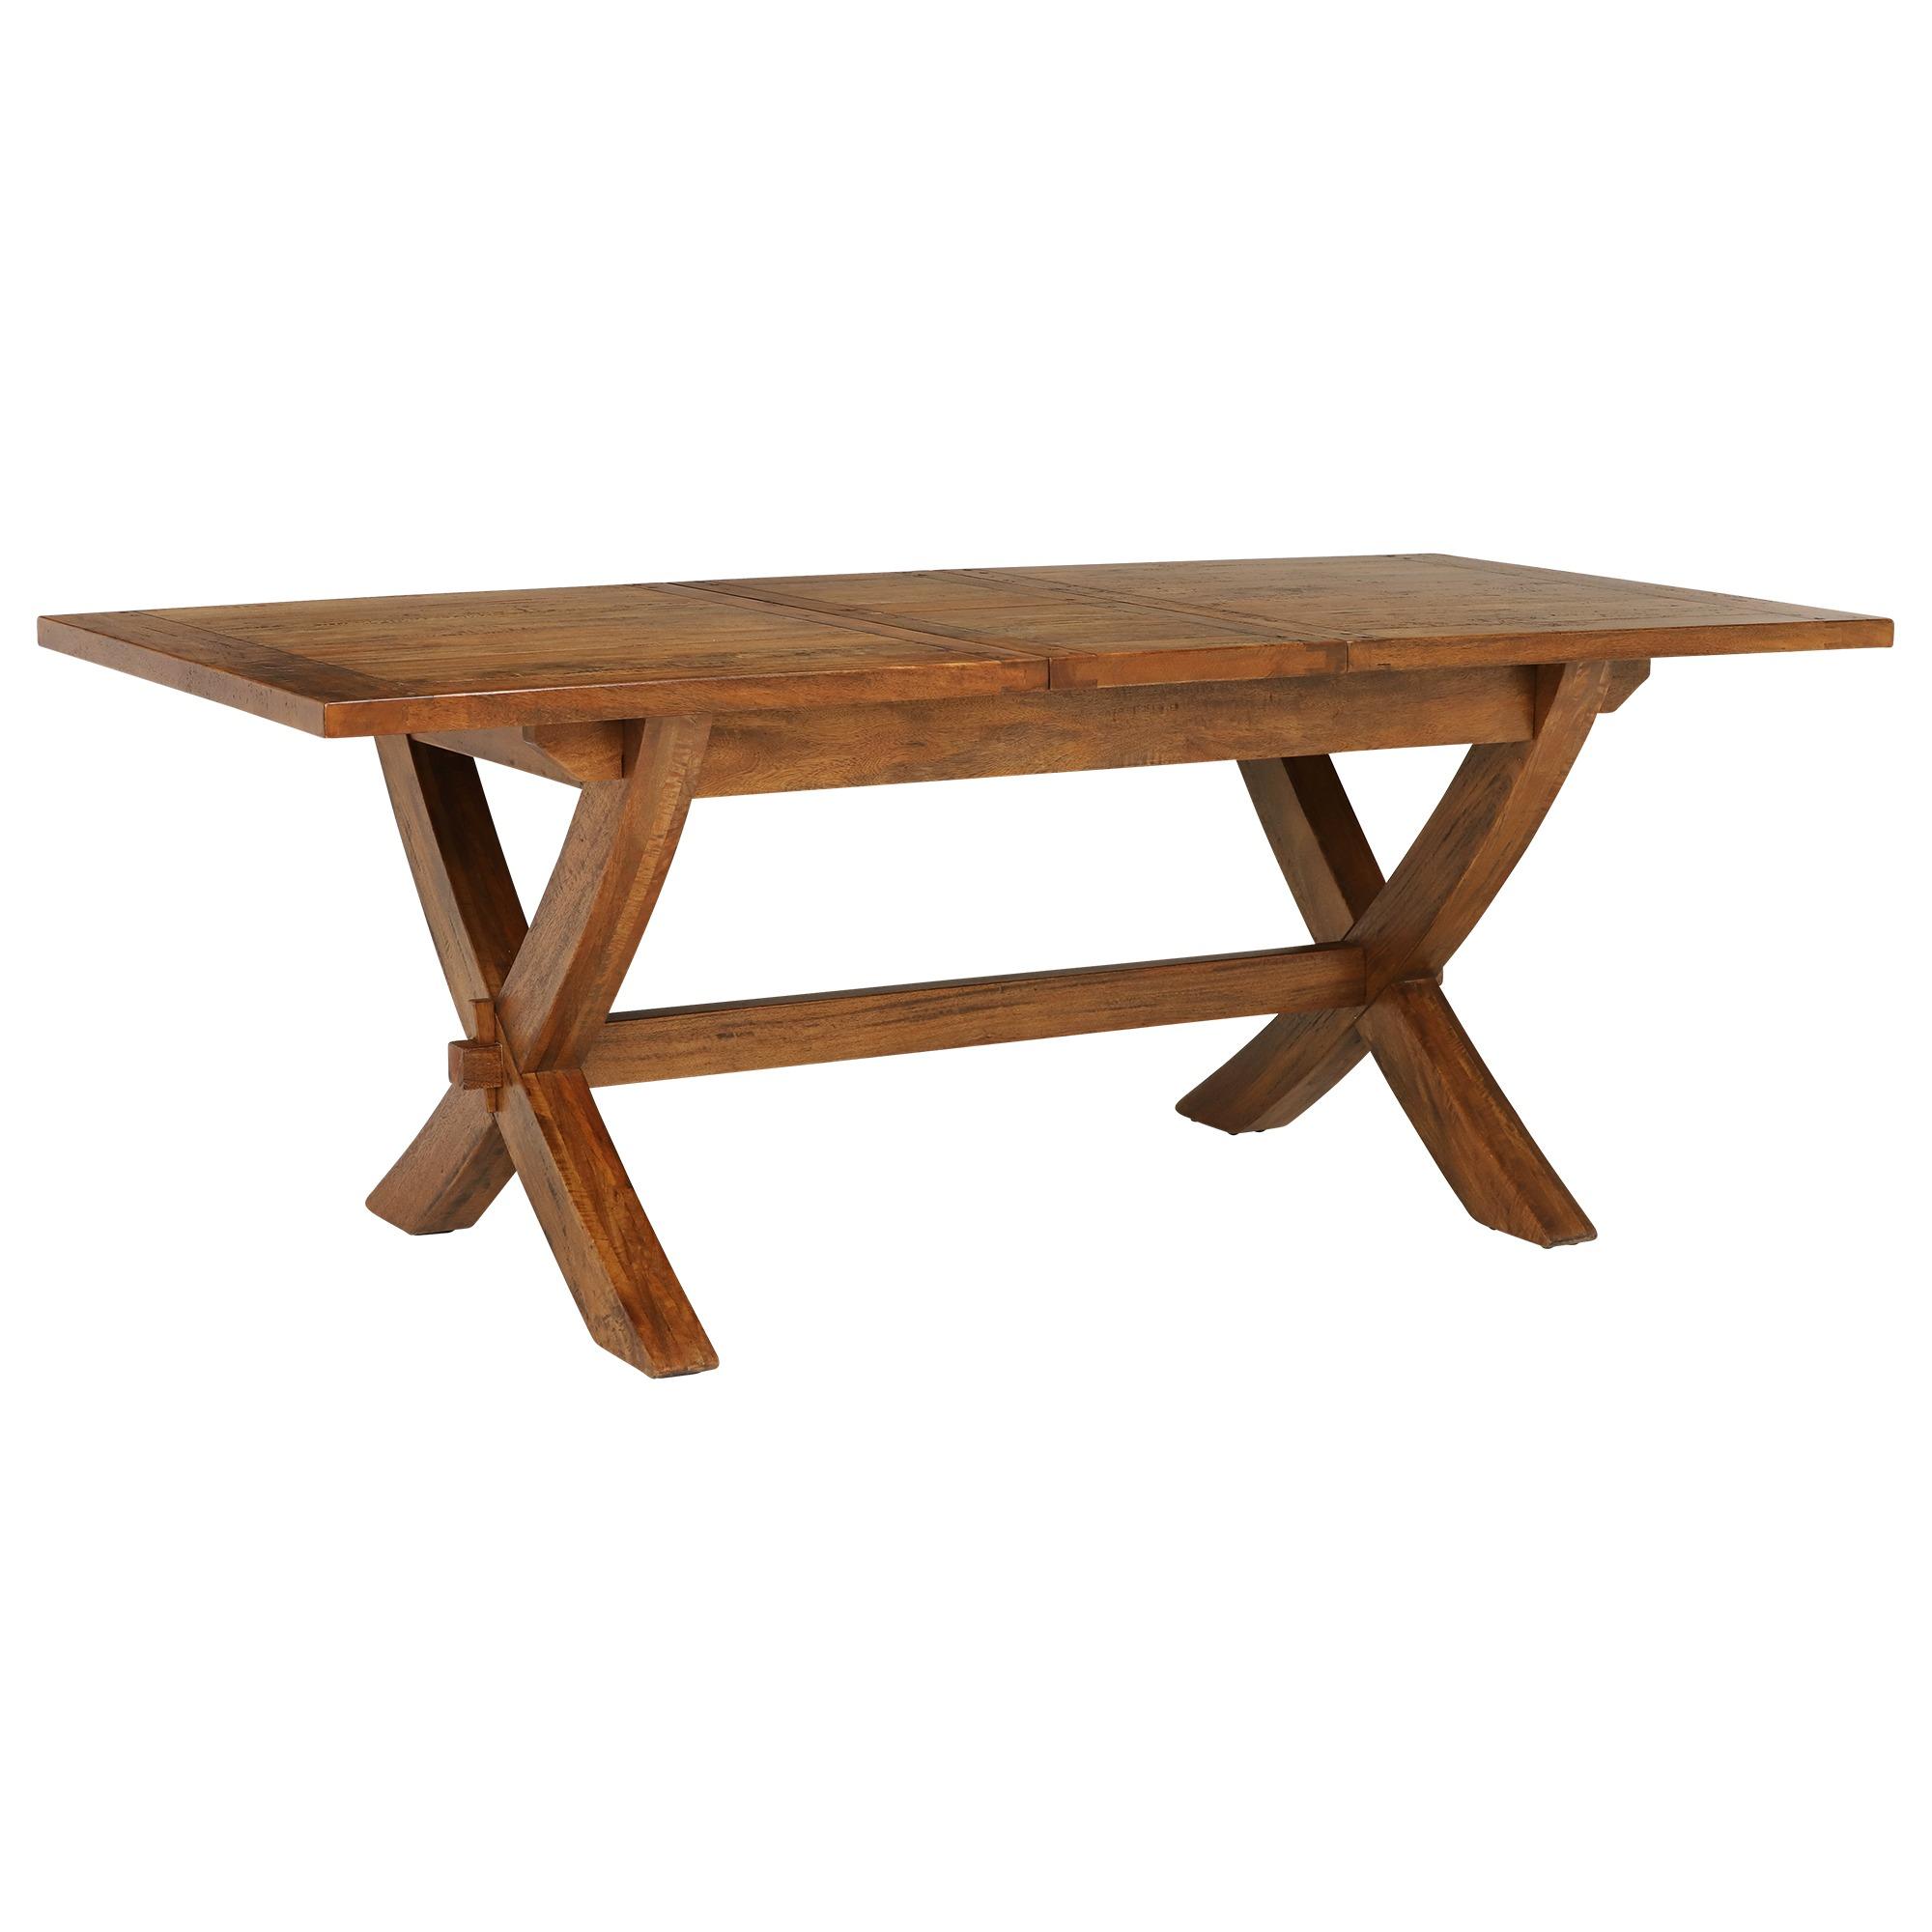 MANGO DINING TABLE - EXTENDED - L210cm x D100cm x H78.5cm